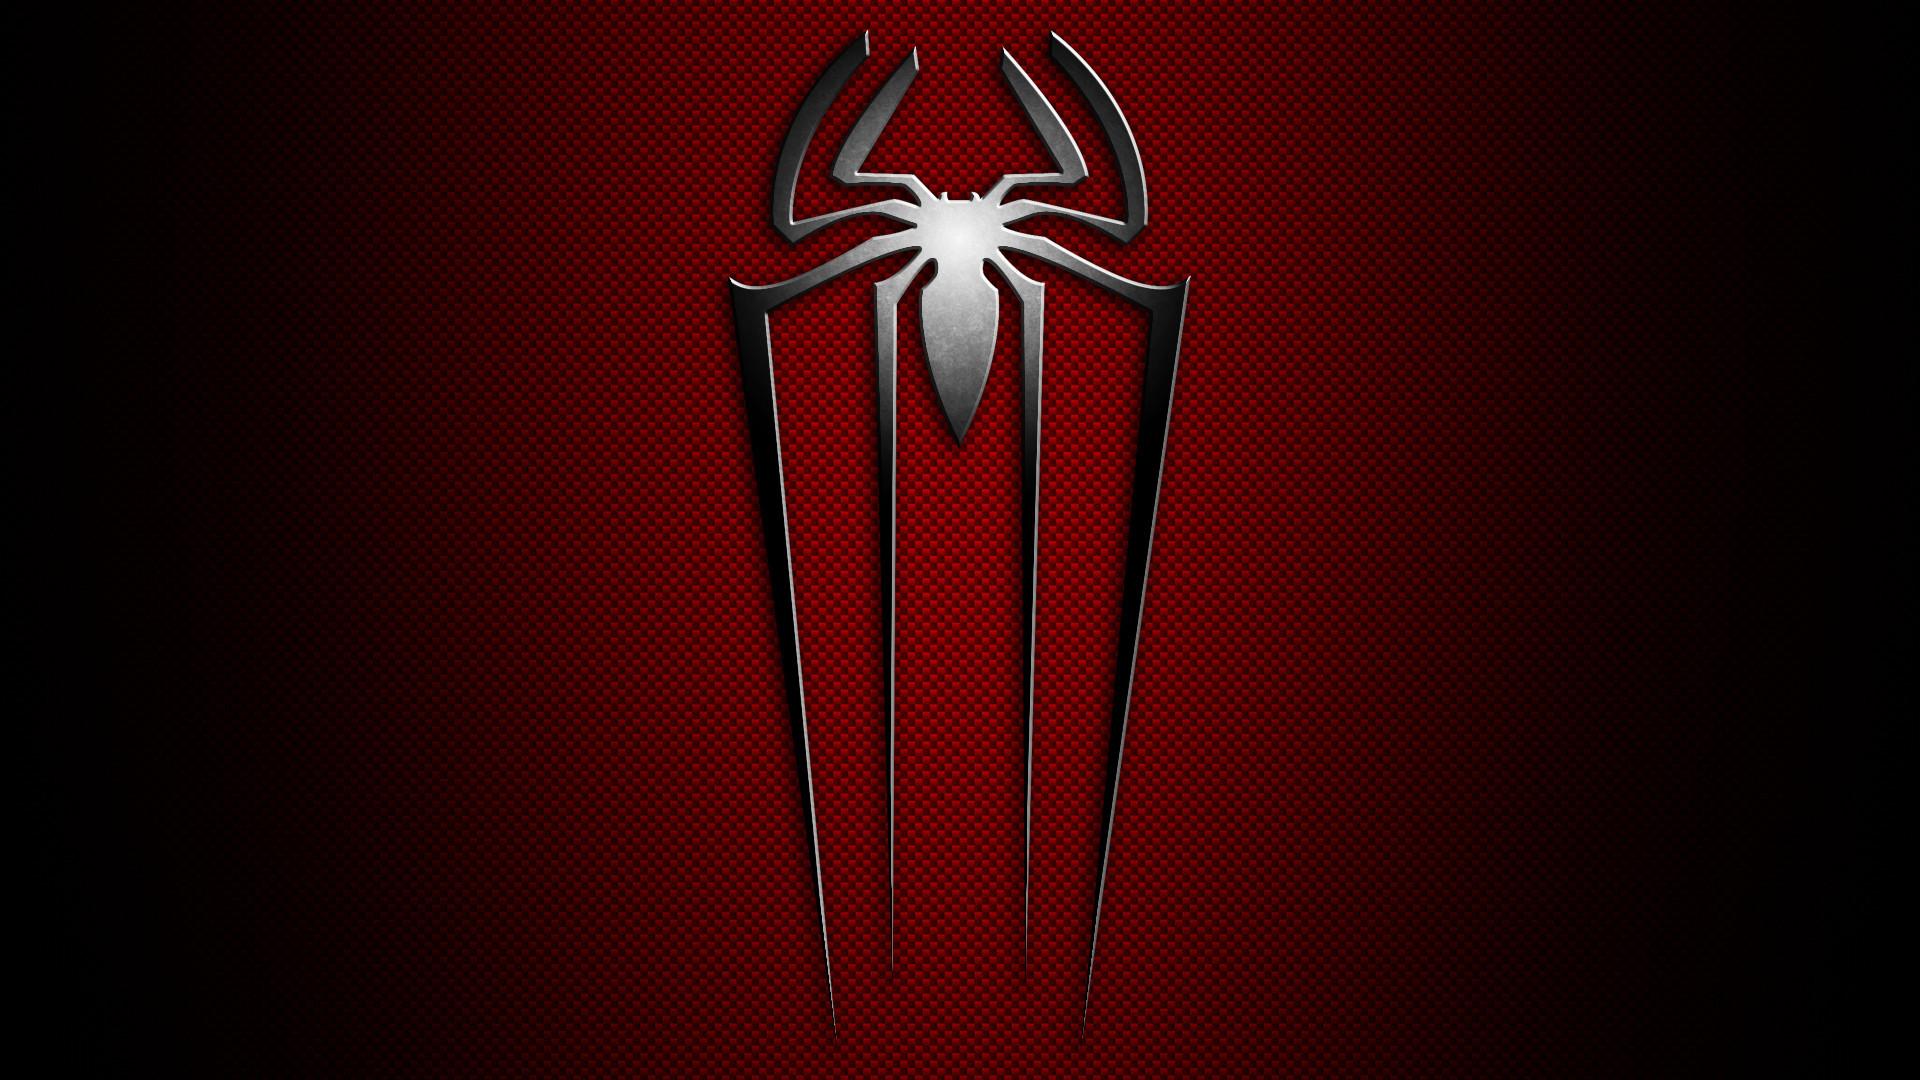 … HD Spiderman Logo Wallpaper